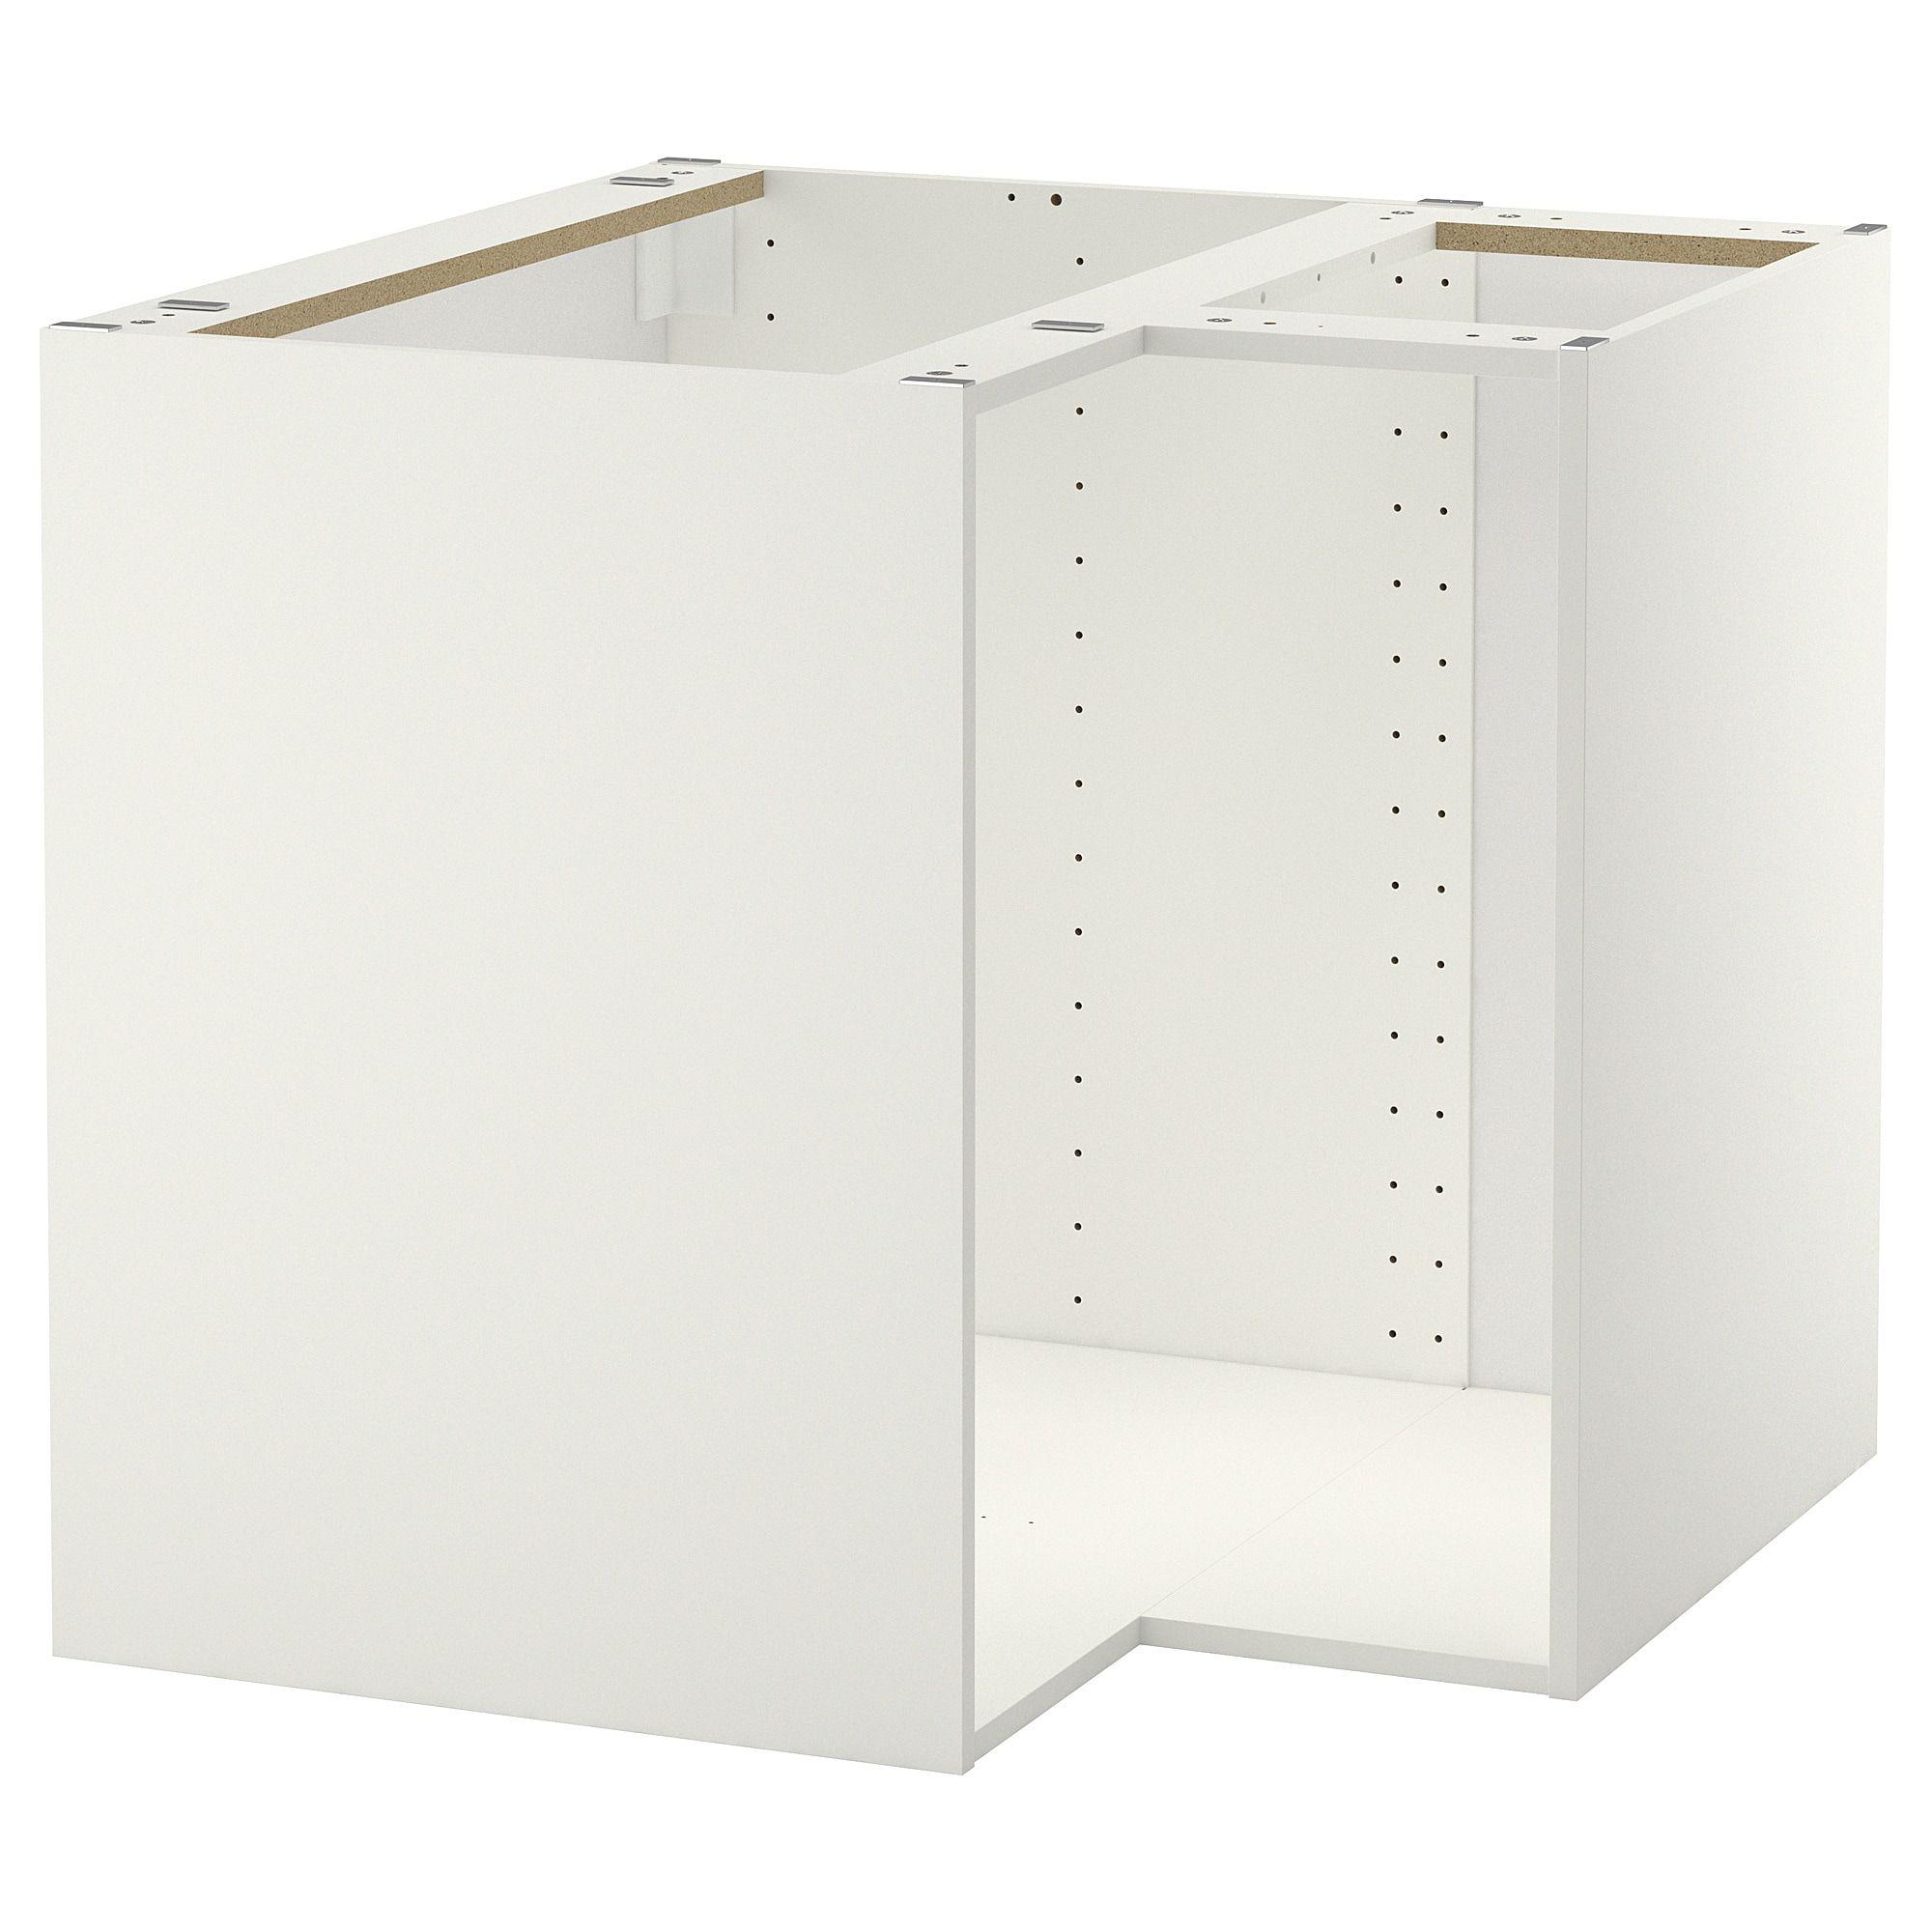 Metod Korpus Eckunterschrank Weiss Ikea Deutschland Eckunterschrank Ikea Unterschrank